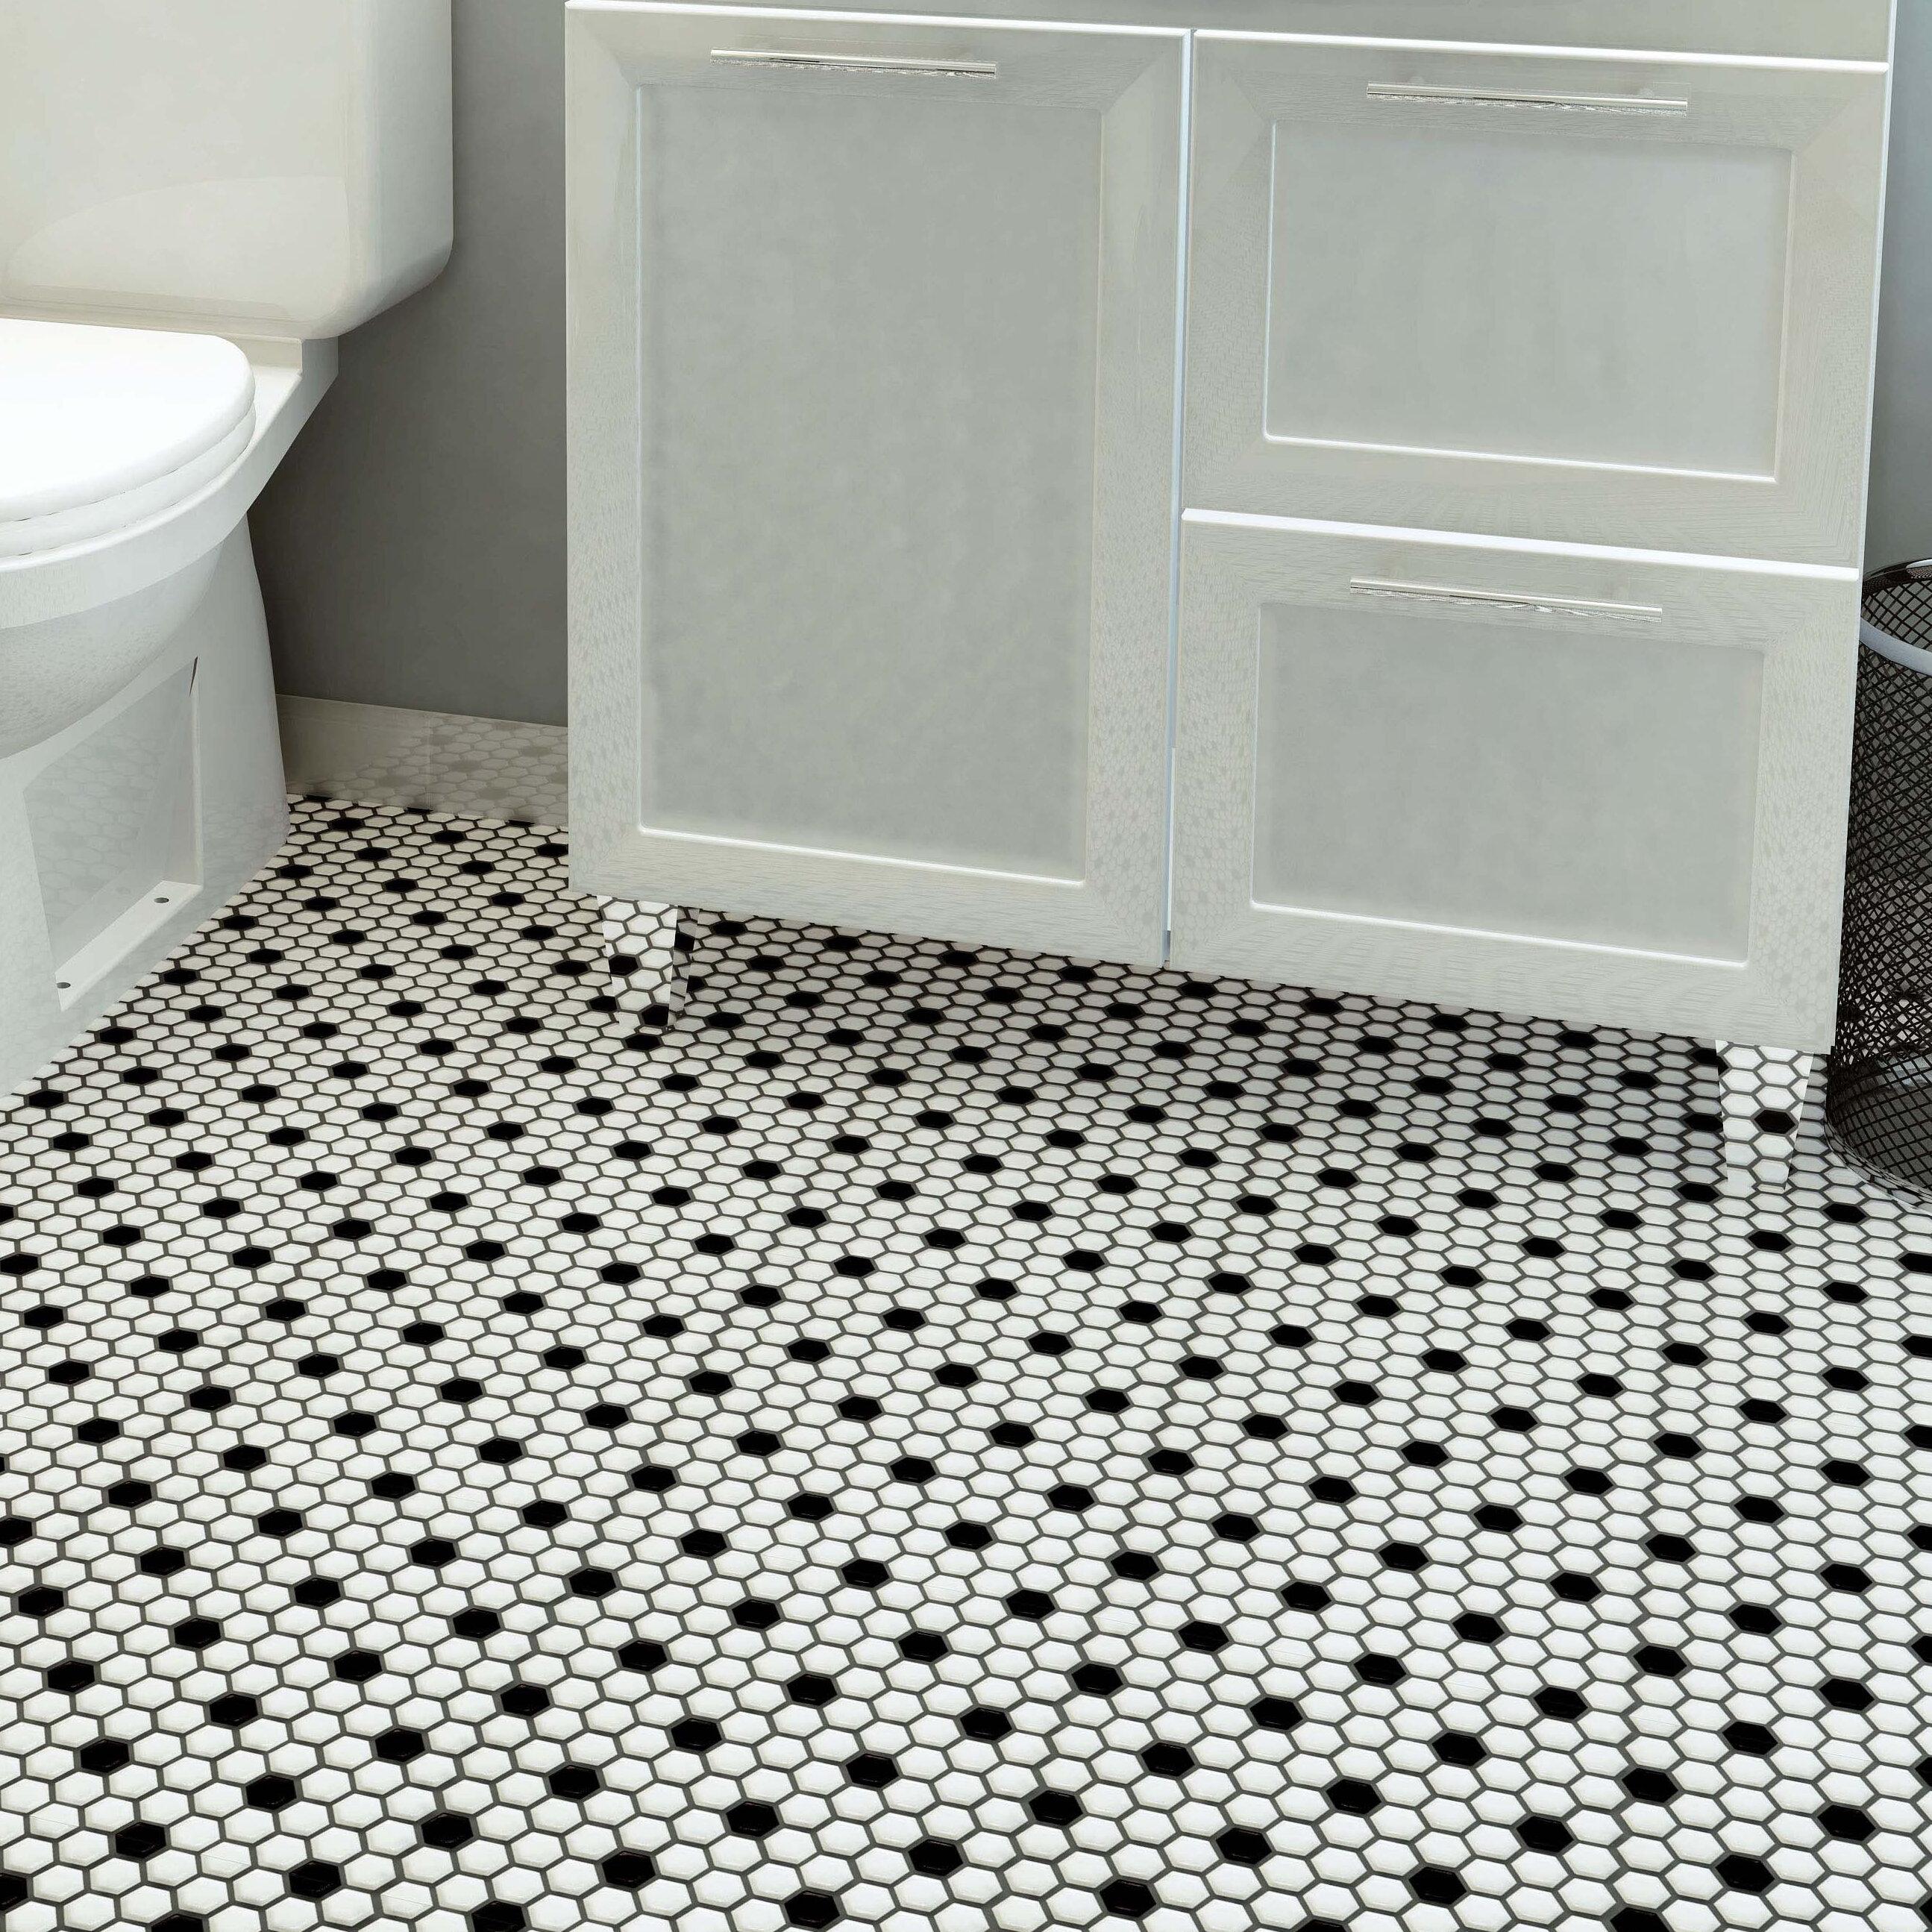 Elitetile Retro 1 X 1 Porcelain Honeycomb Mosaic Wall Floor Tile Reviews Wayfair